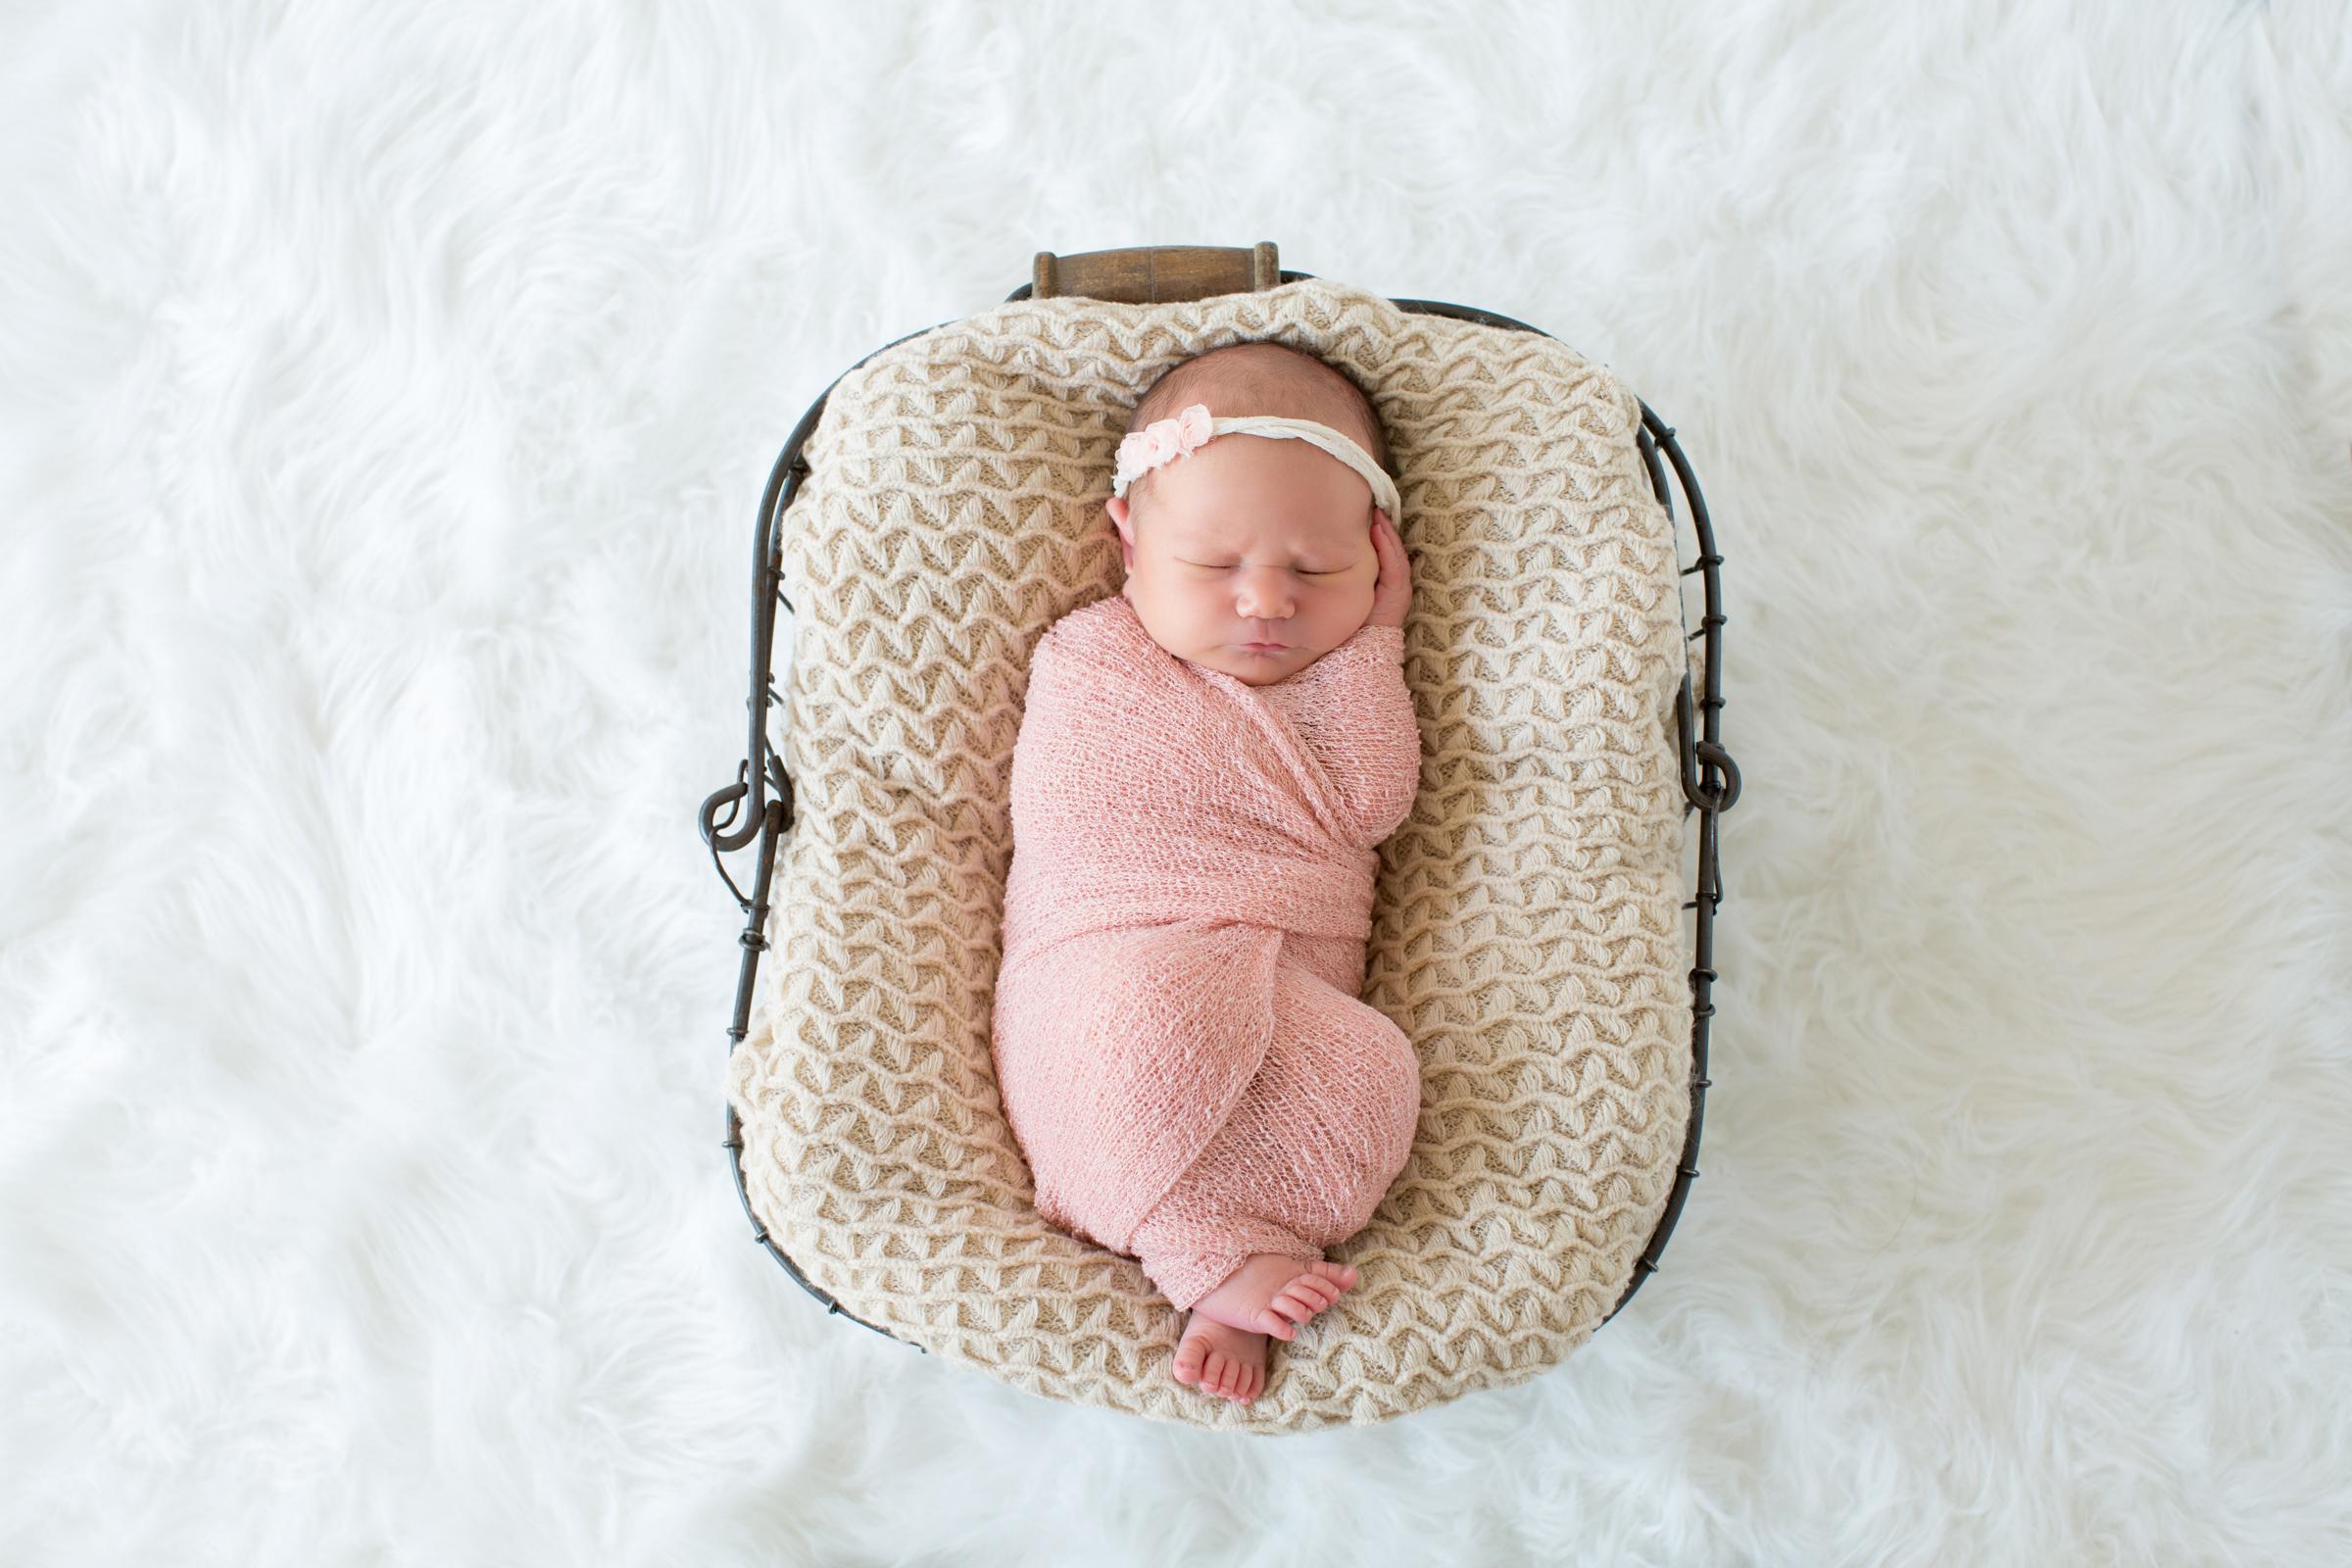 baby-girl-swaddled-in-pink.jpg